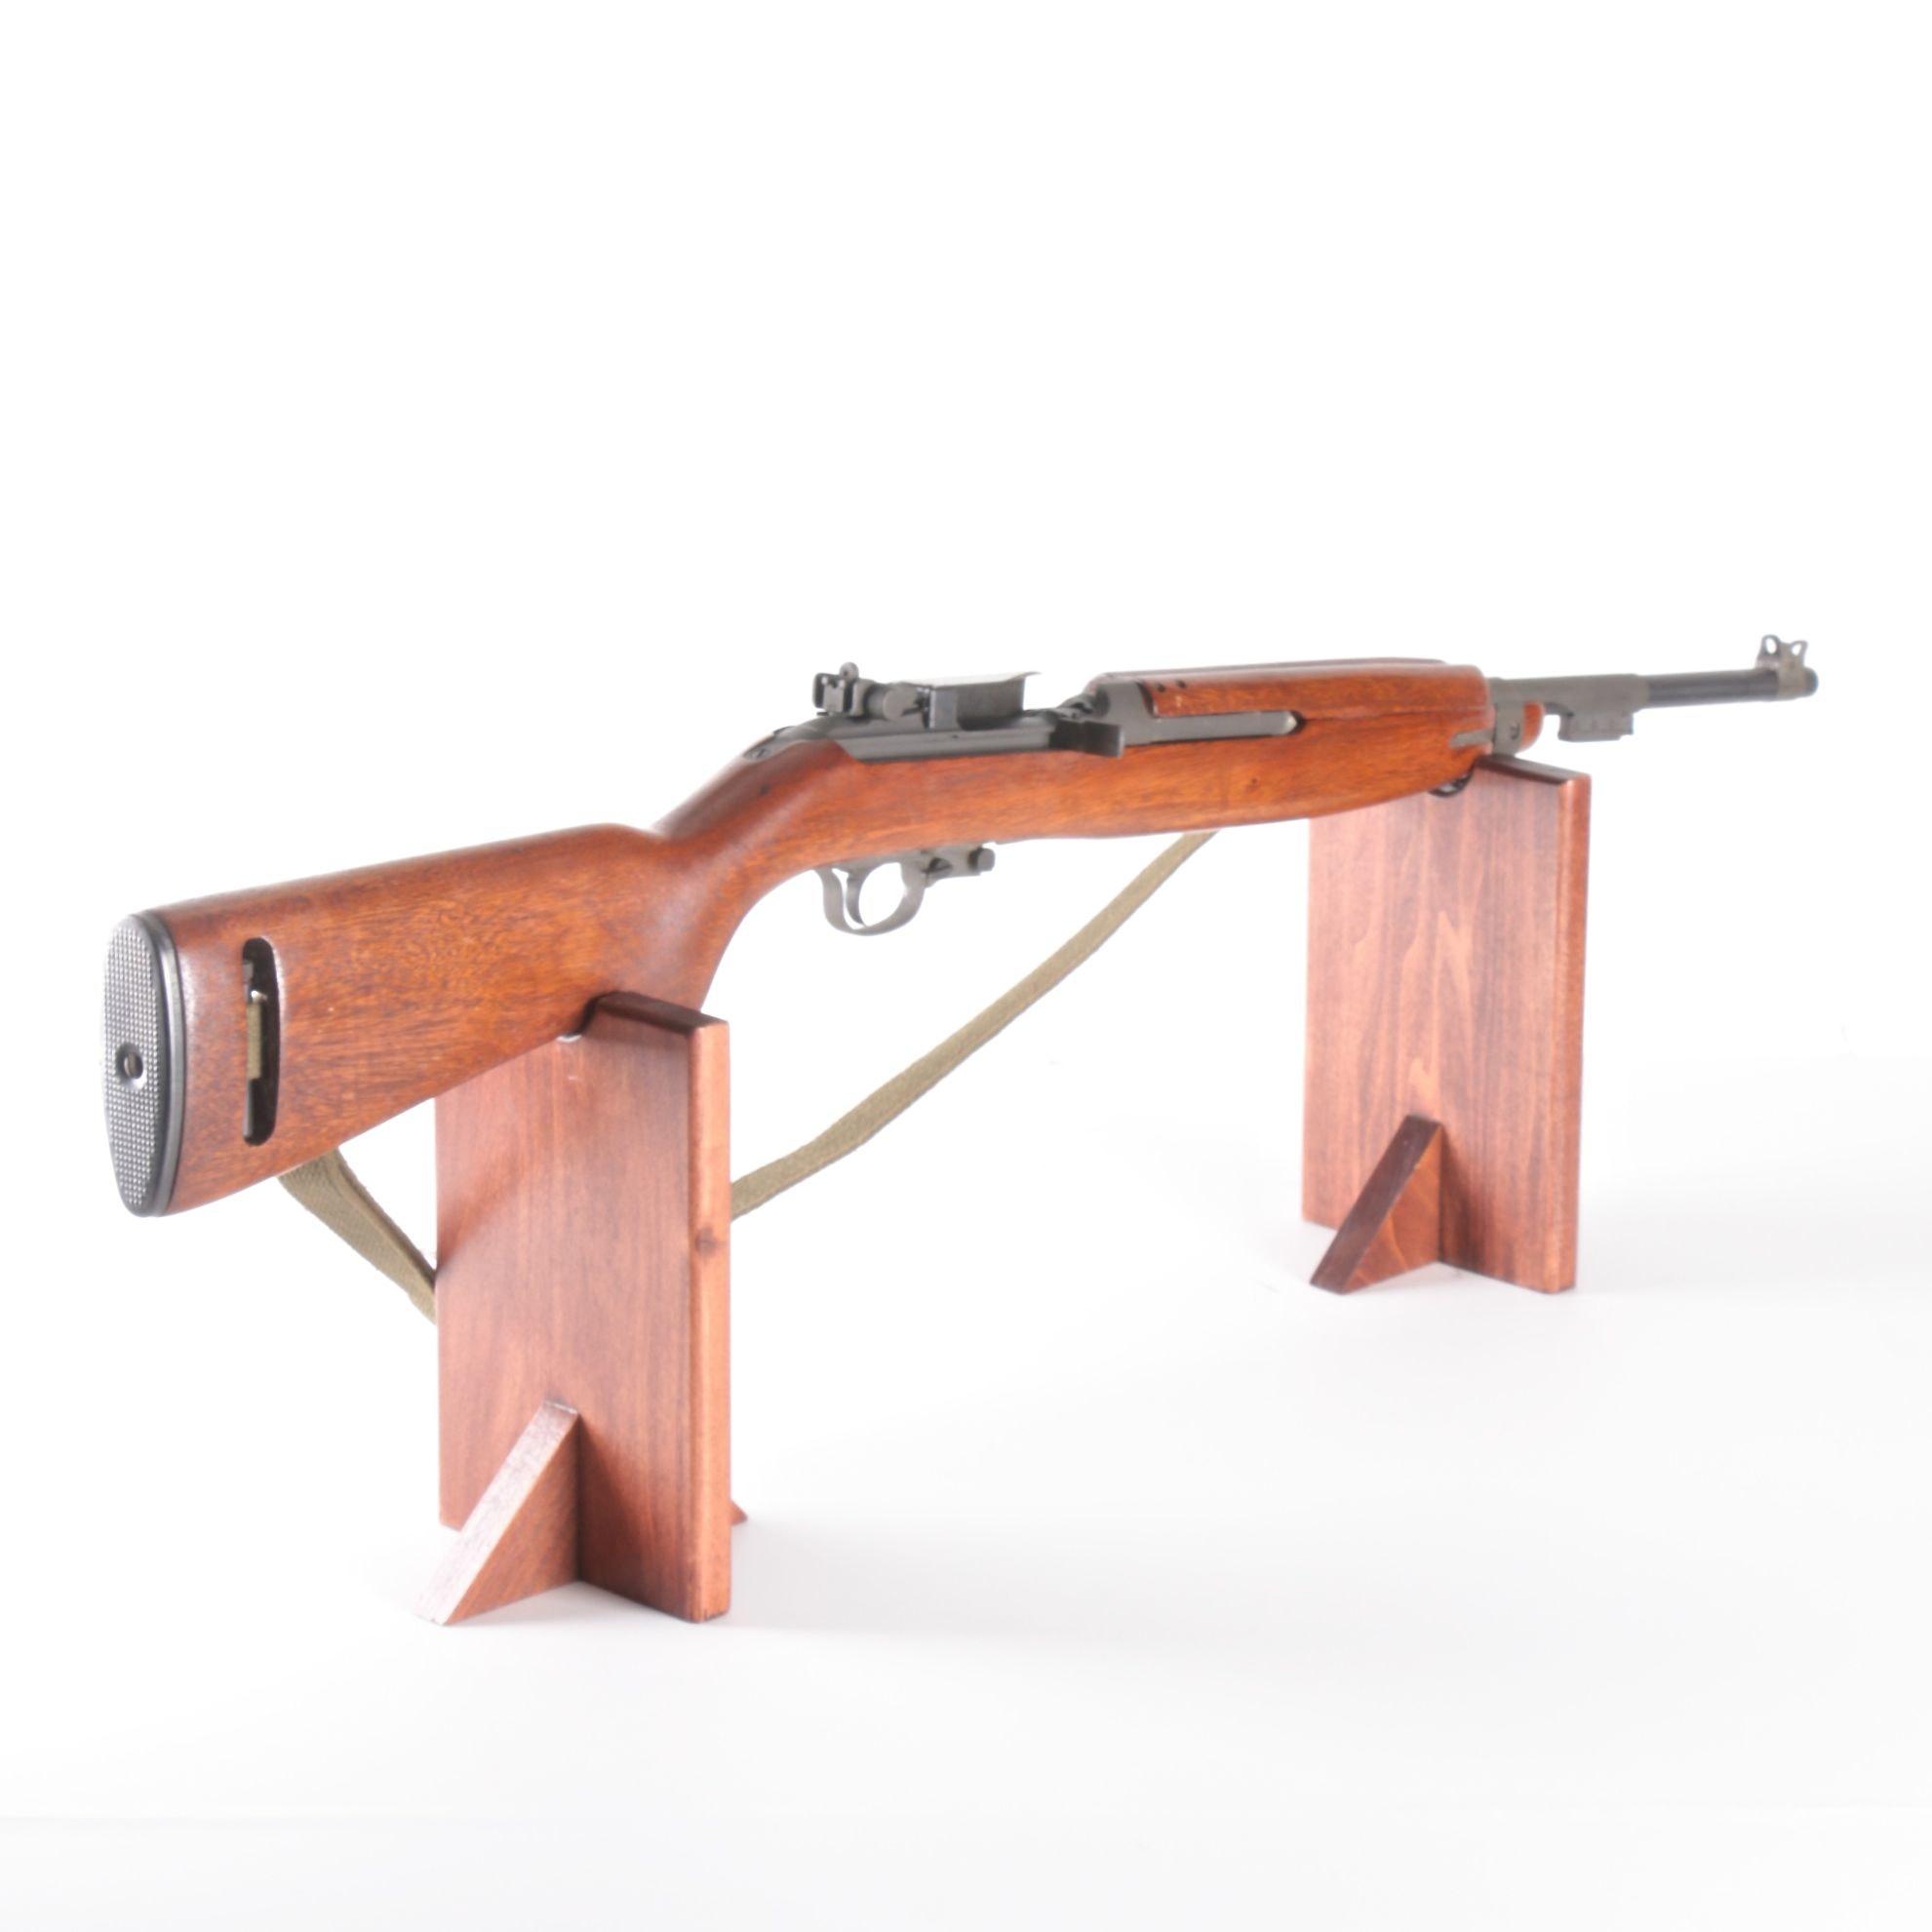 World War II Era NPM .30 Caliber Semi-Automatic M1 Carbine